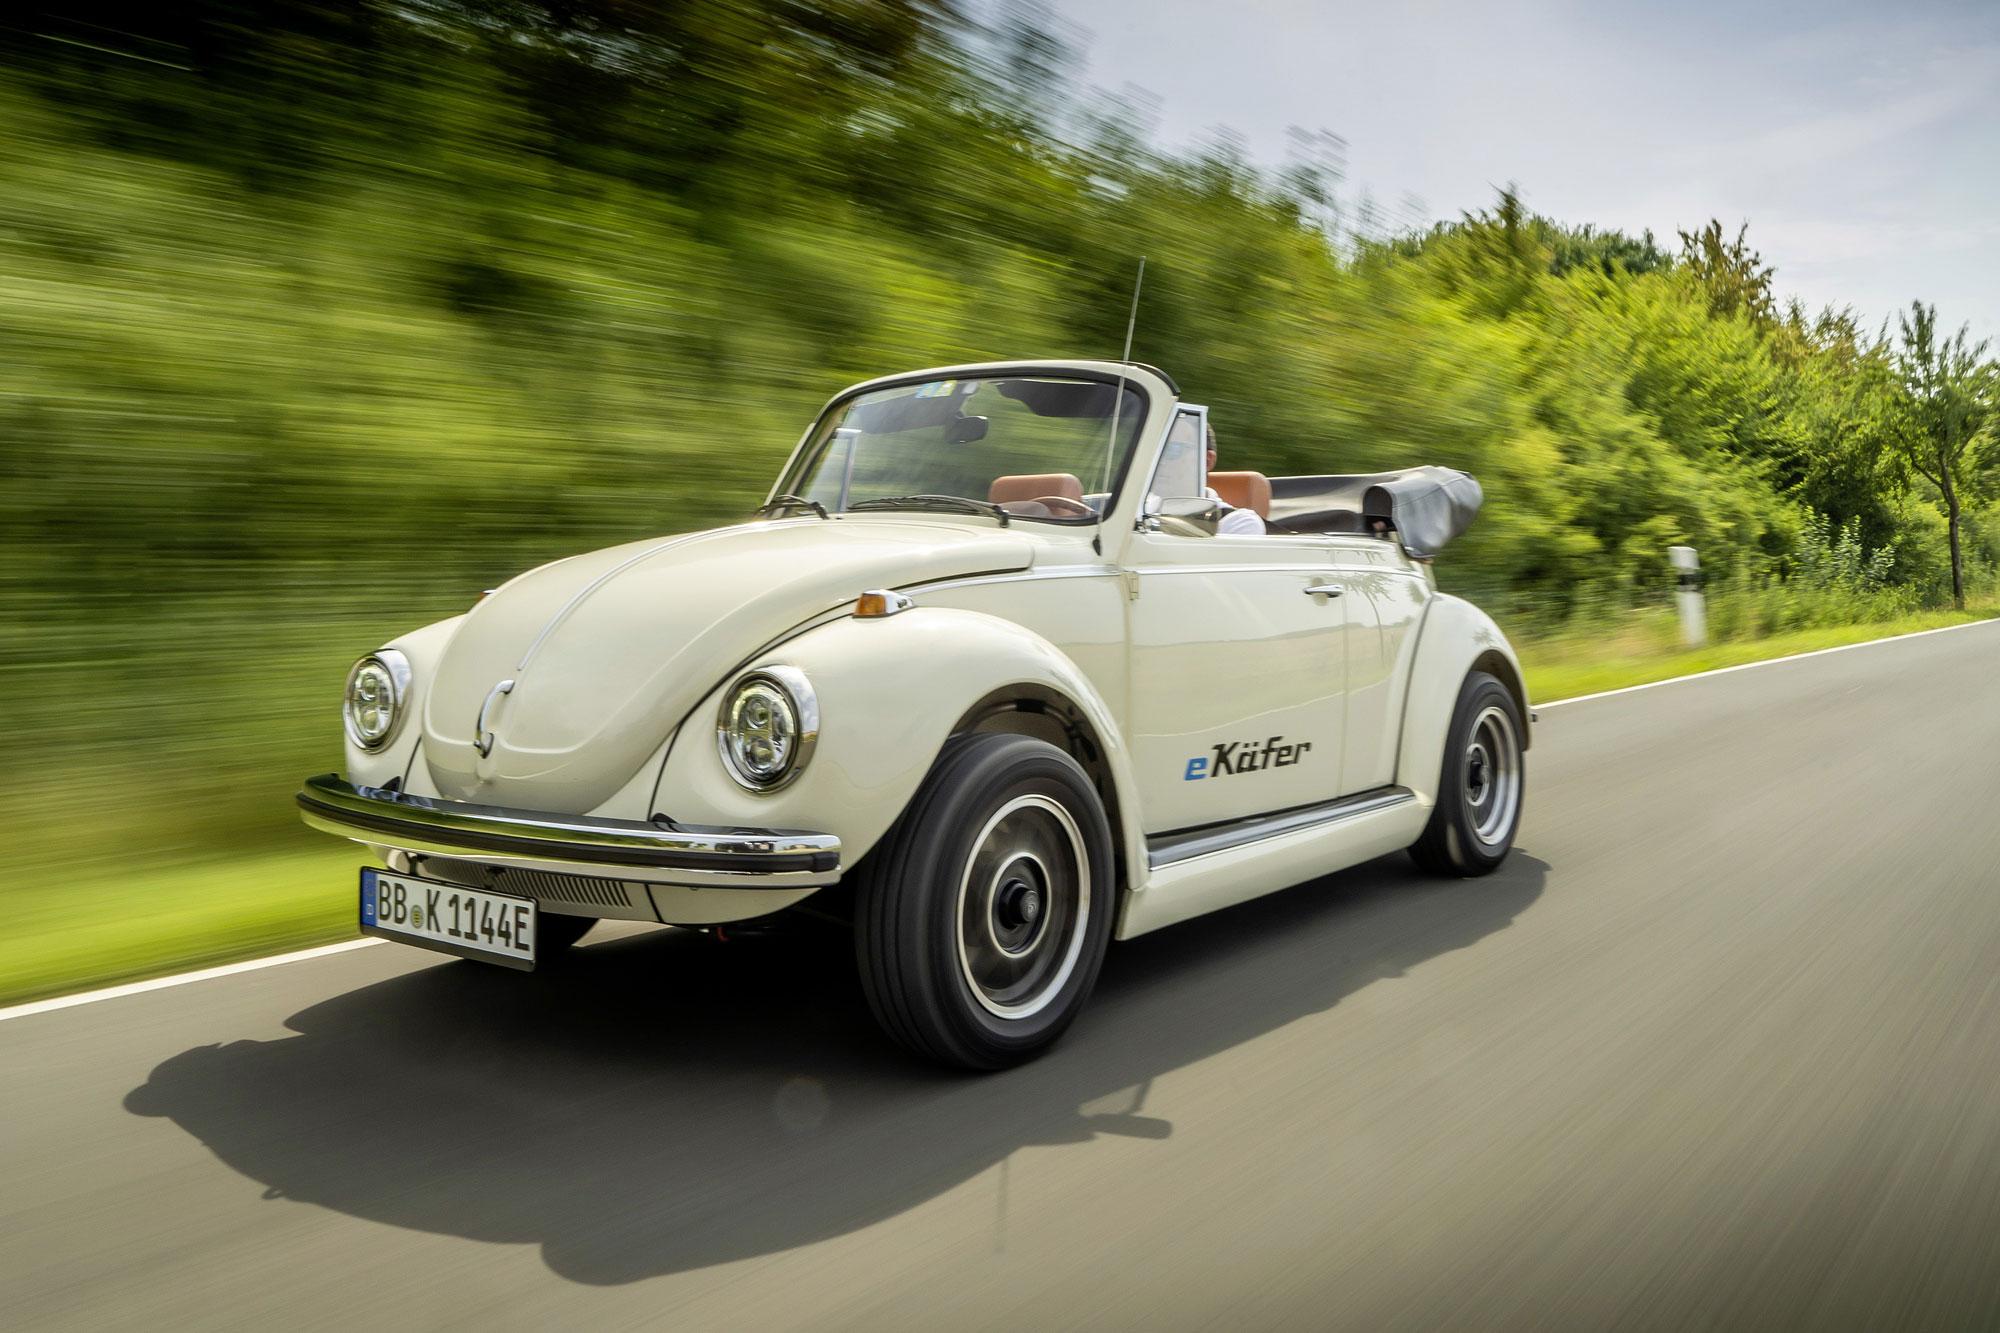 e-Beetle 屬於 eClassic 電動經典再生的首發作品。